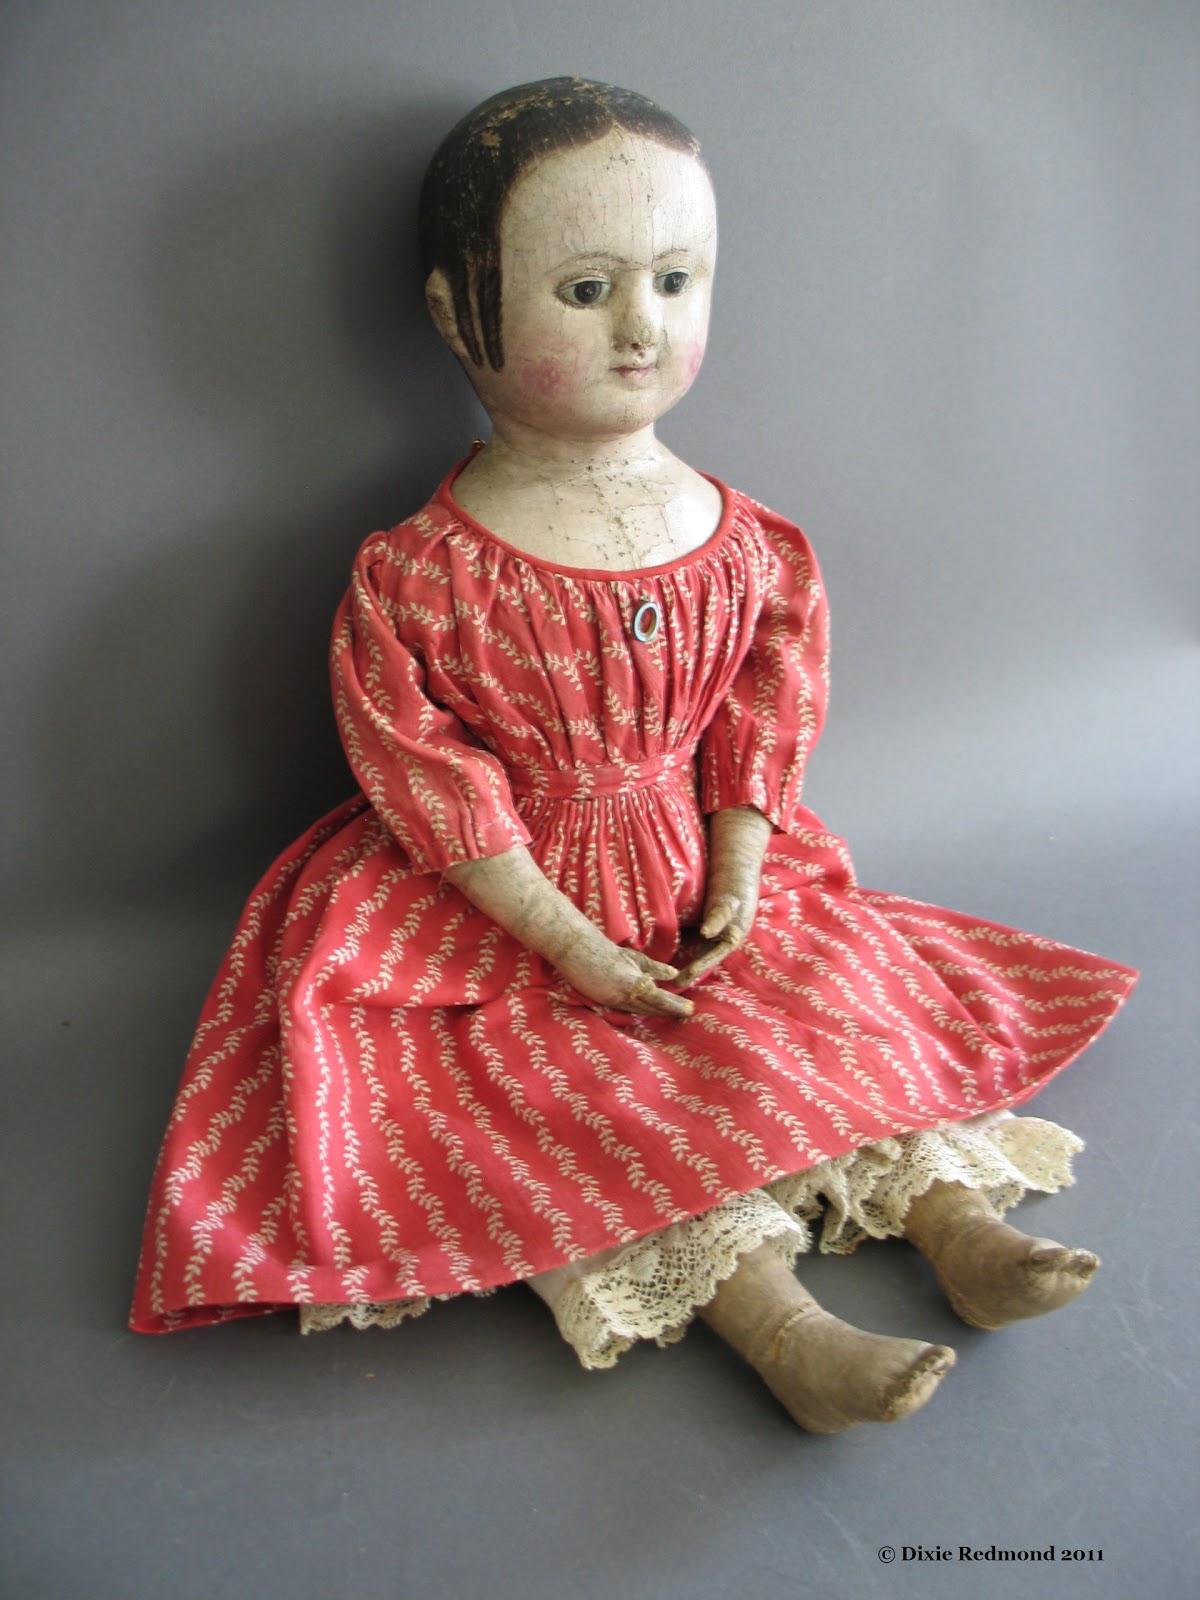 izannah walker chronicles 12 08 11 rh izannahwalkerchronicles com izannah walker doll kit izannah walker doll kit